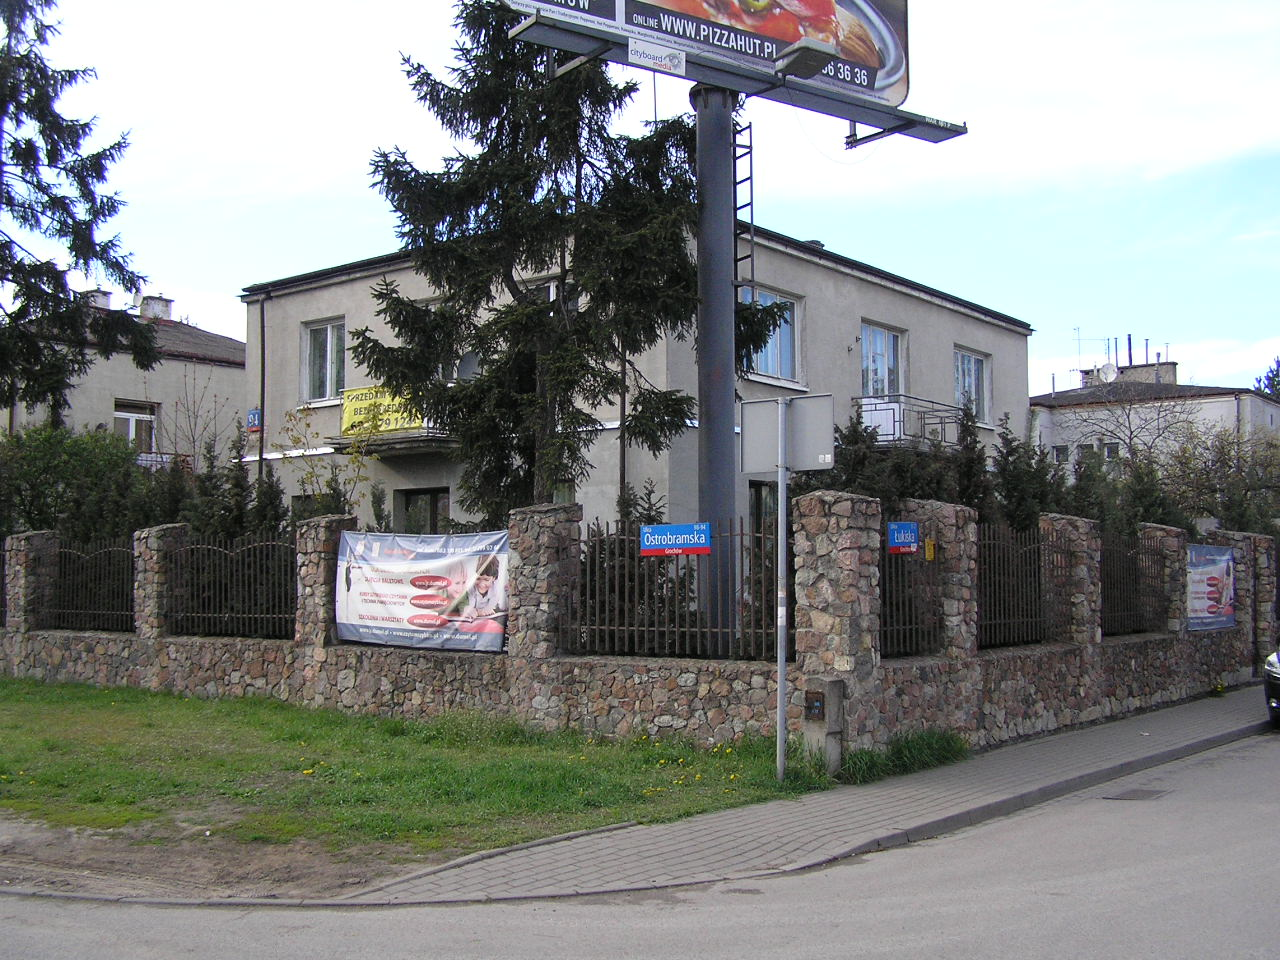 Ostrobramska 94